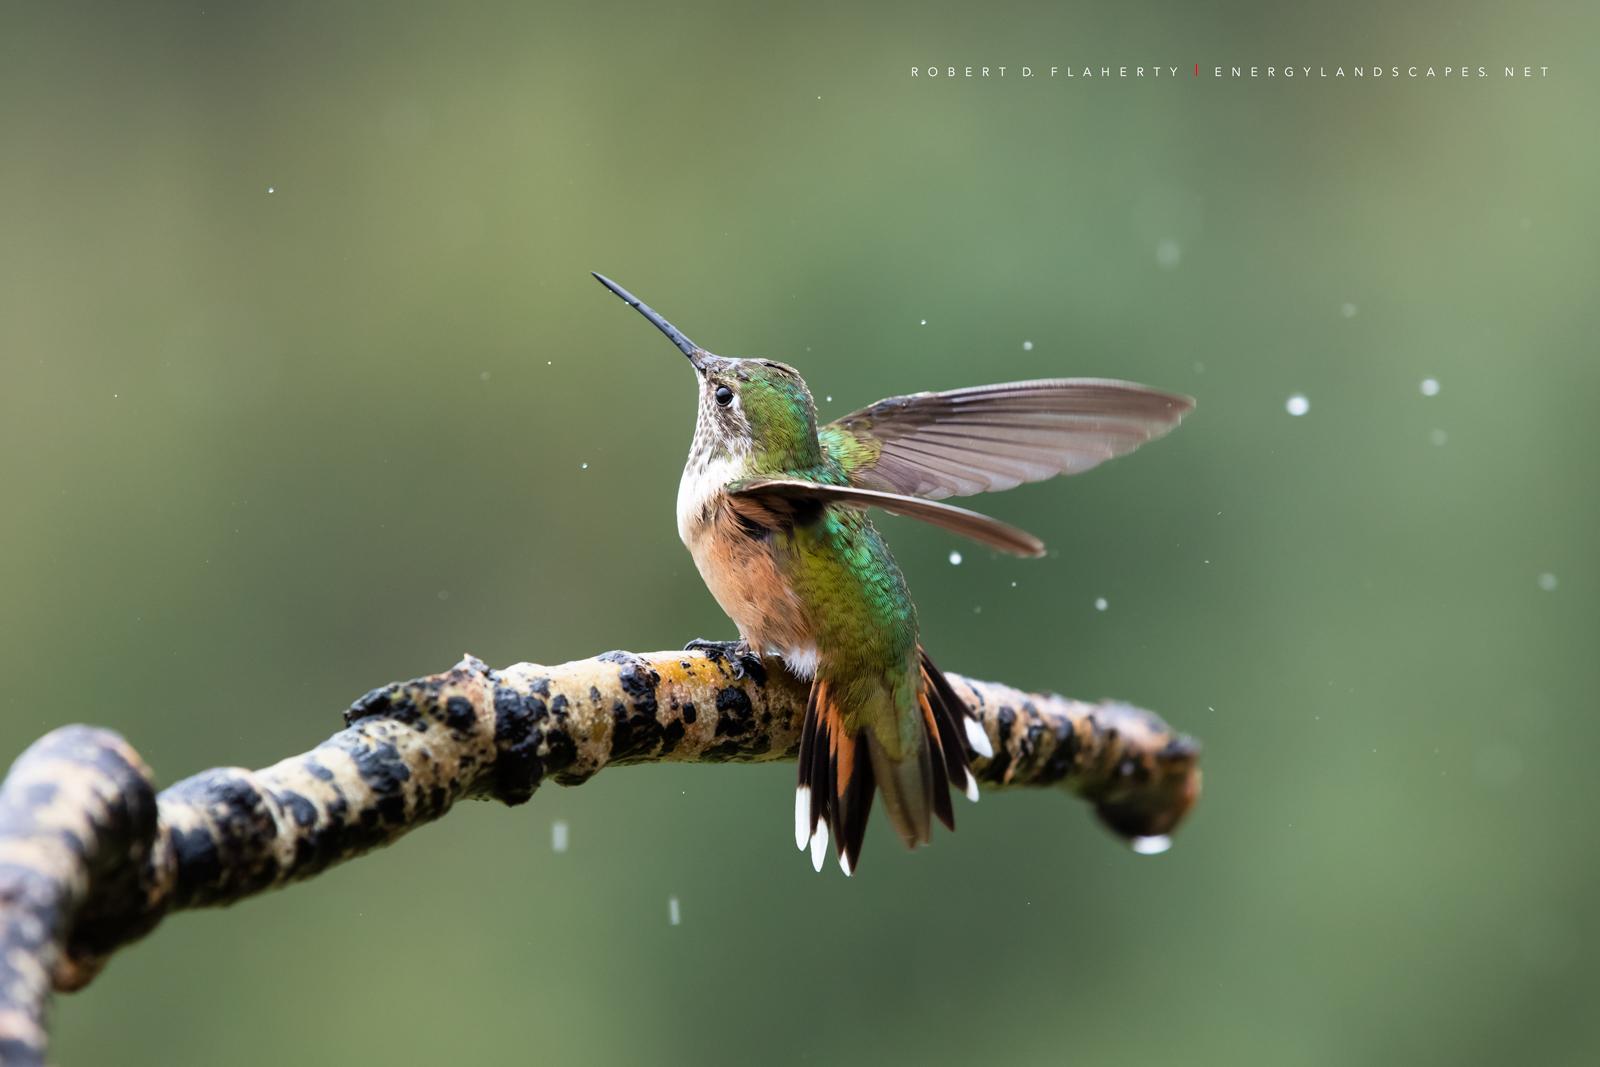 Rain Dance, hummingbird, hummingbirds, fine art photography, New Mexico, South Central Mountains, monsoon, Ruidoso, Ruidoso New Mexico, rain, Thunderstorm, fine art, photo